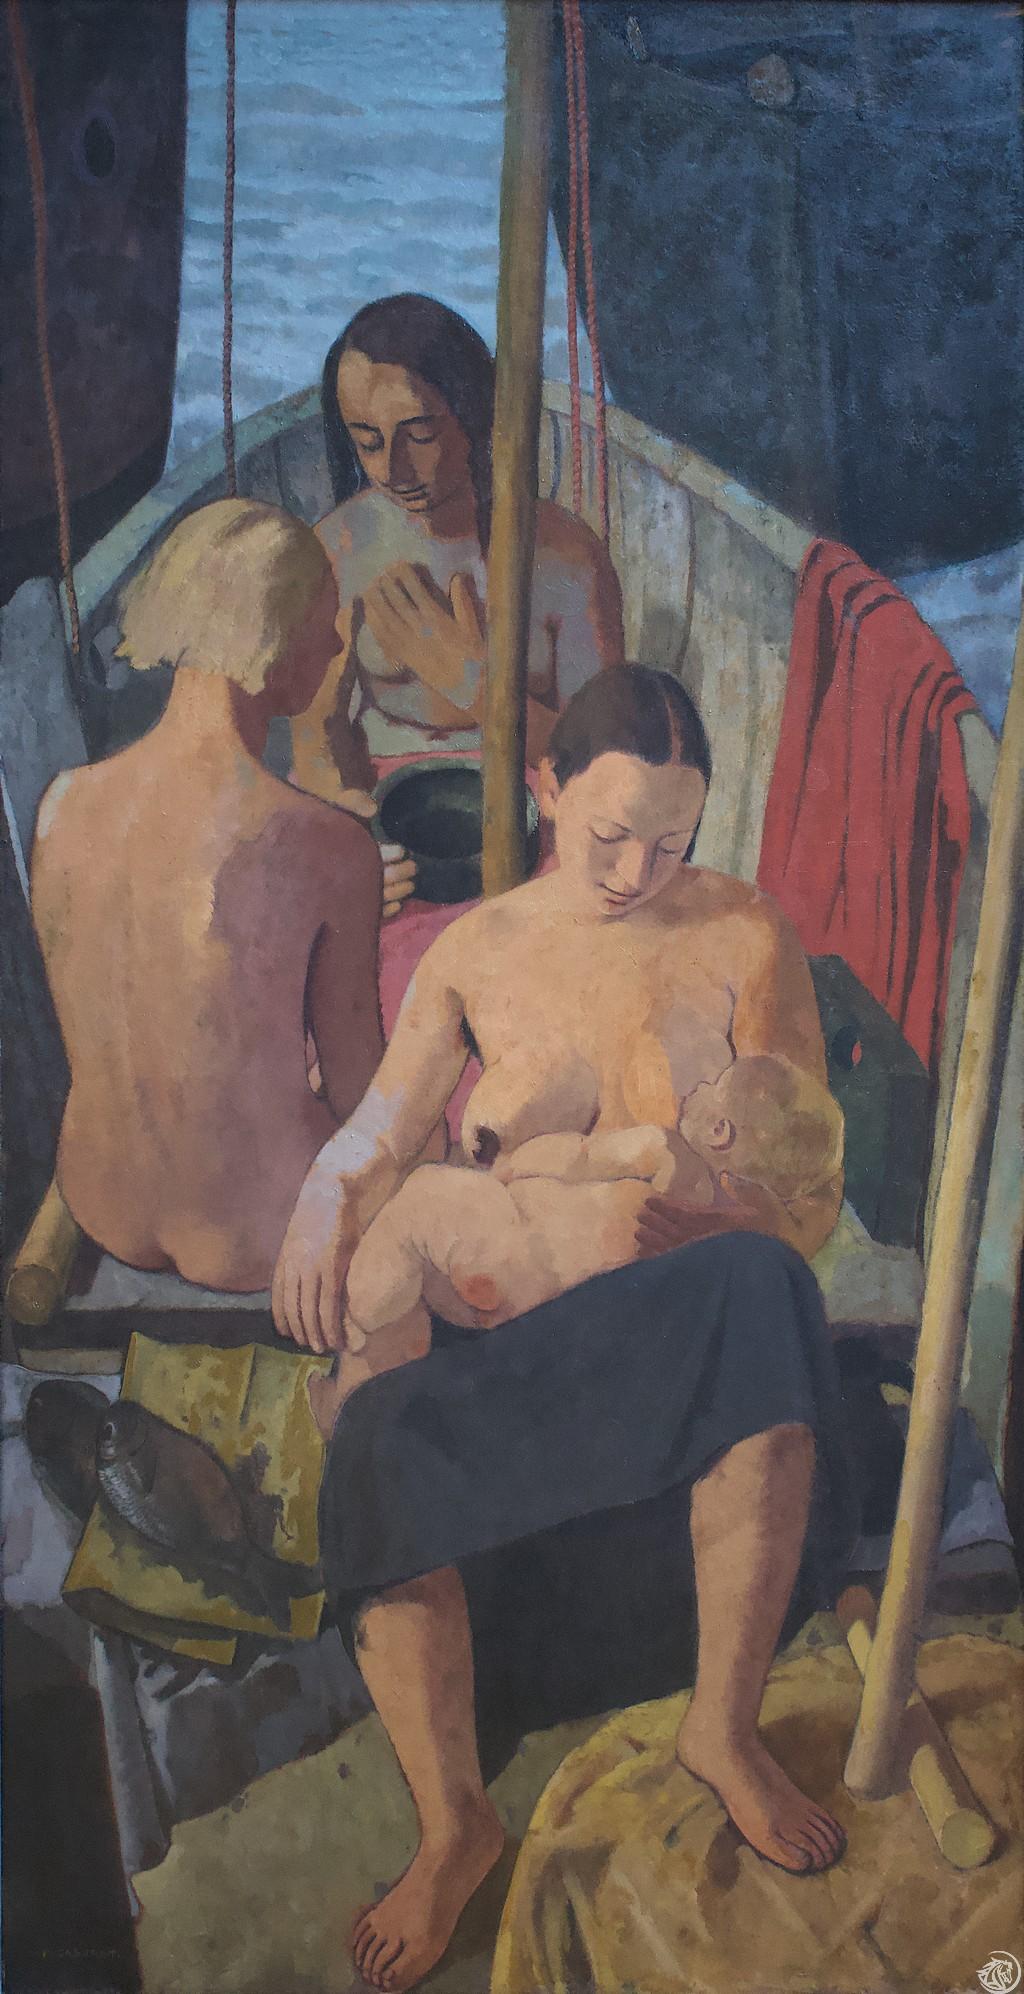 GRO_Felice Casorati, Donne in Barca_1933